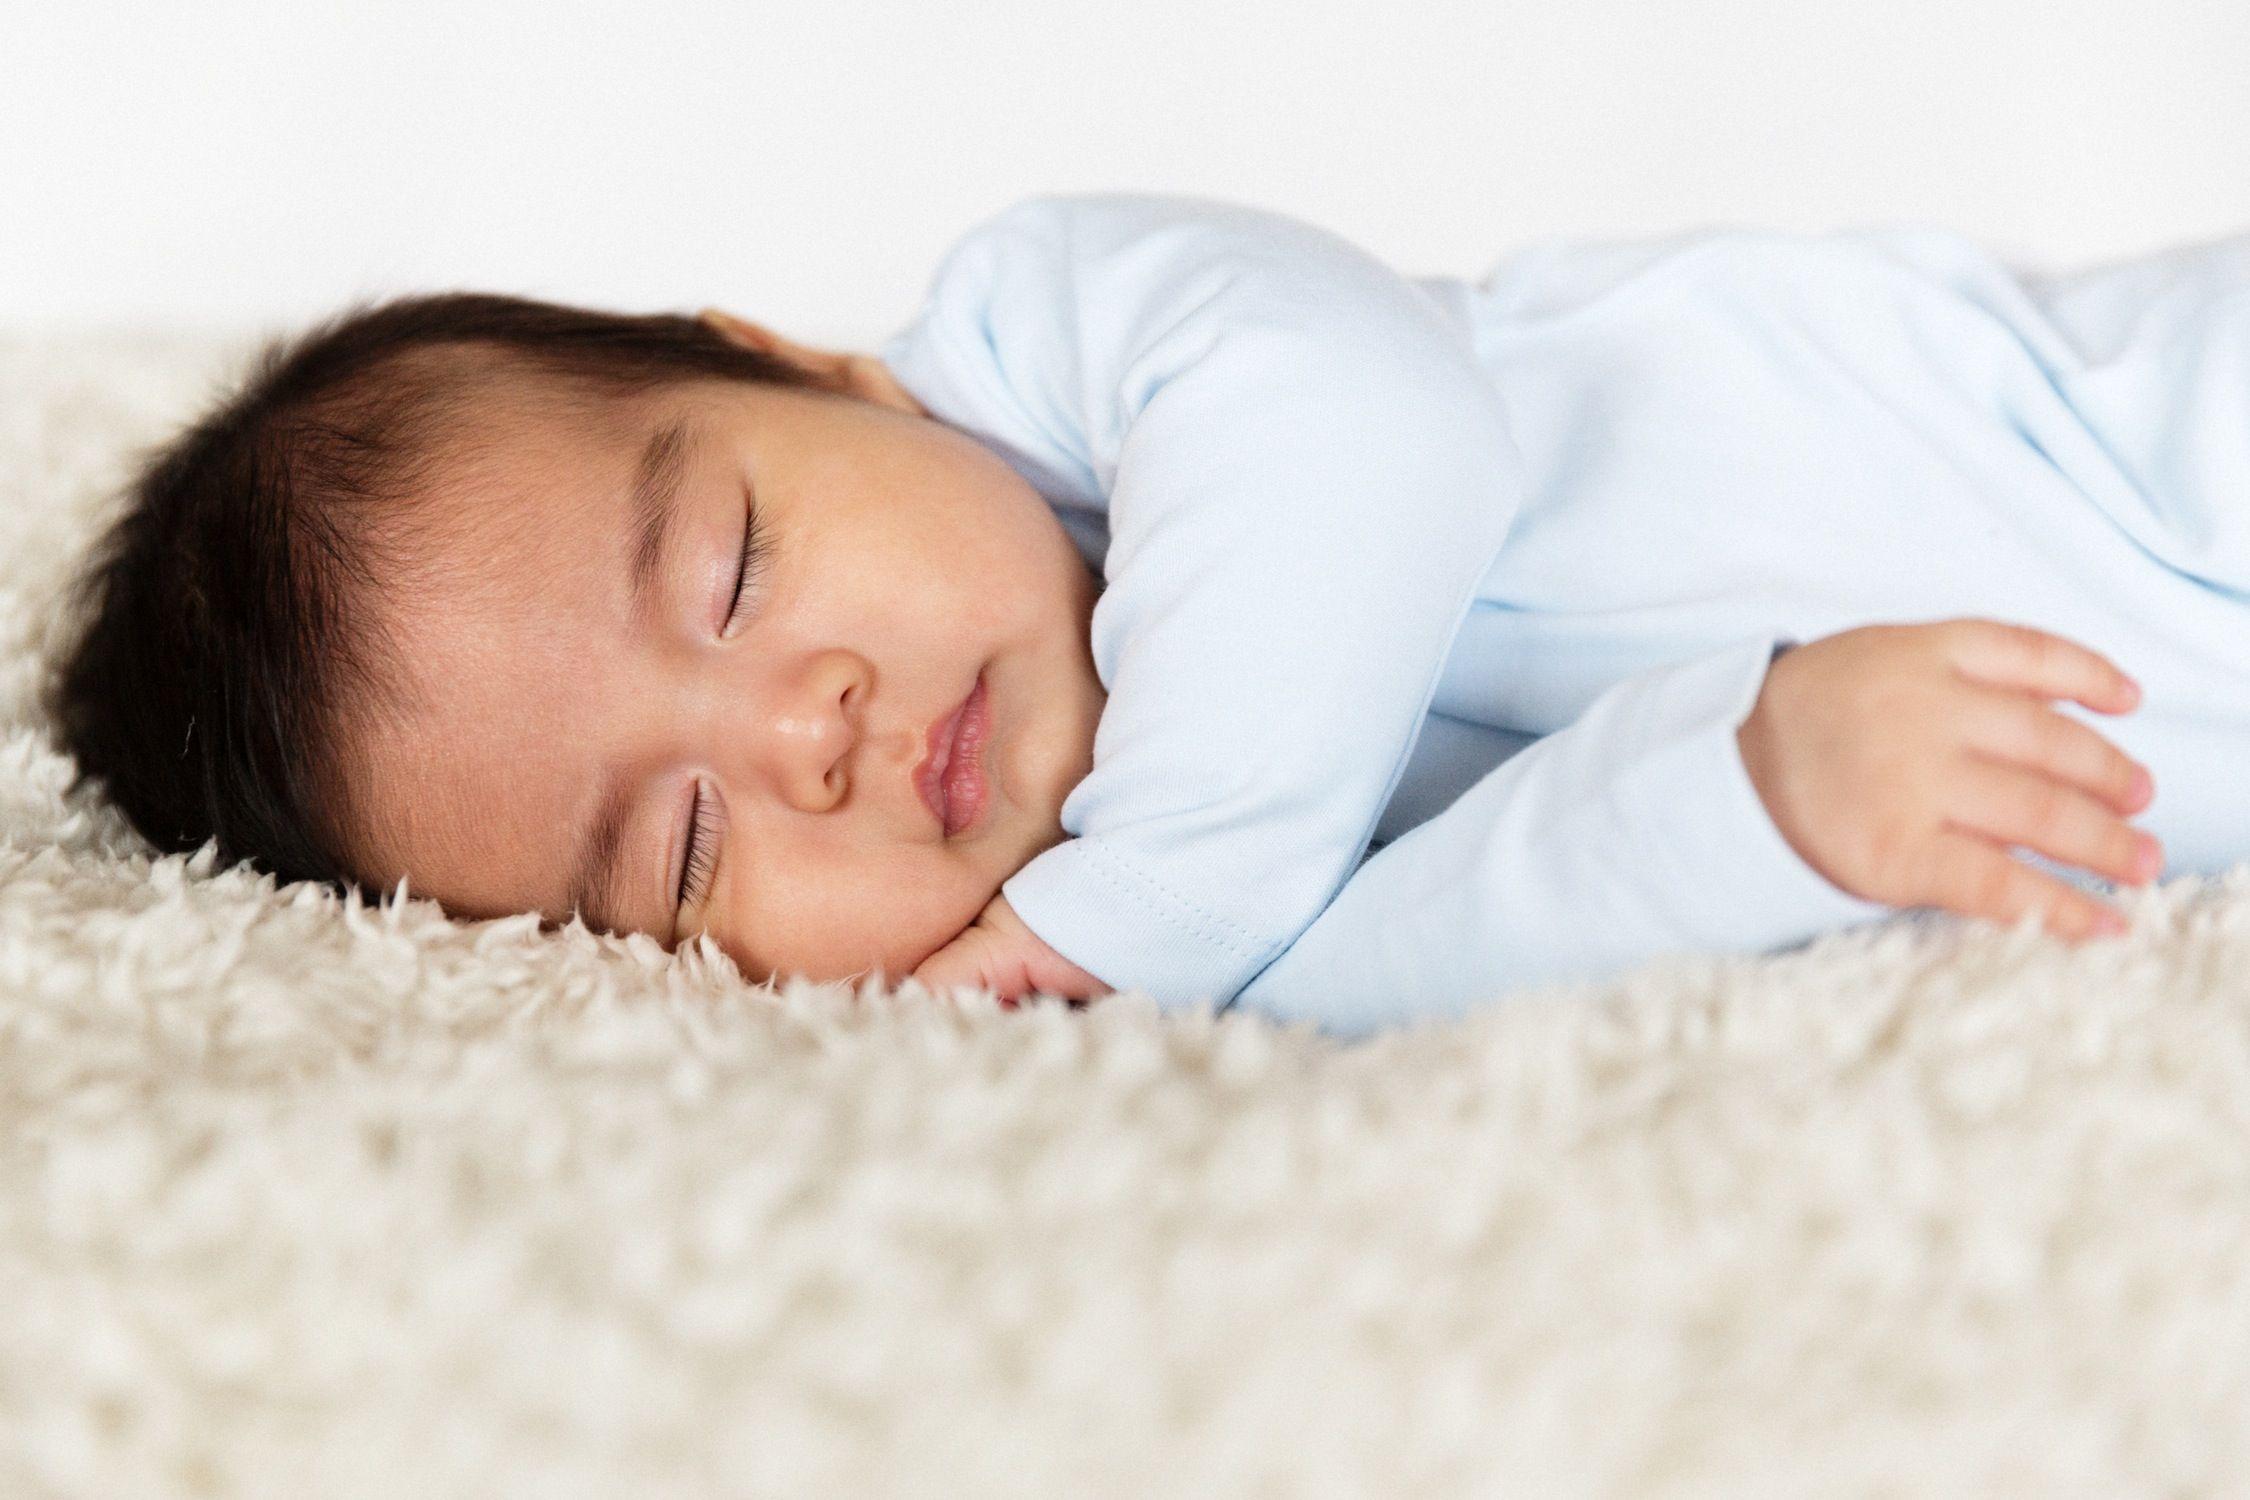 Con Petit Oh! se duerme mejor. Pijama de manga larga en algodón Pima.